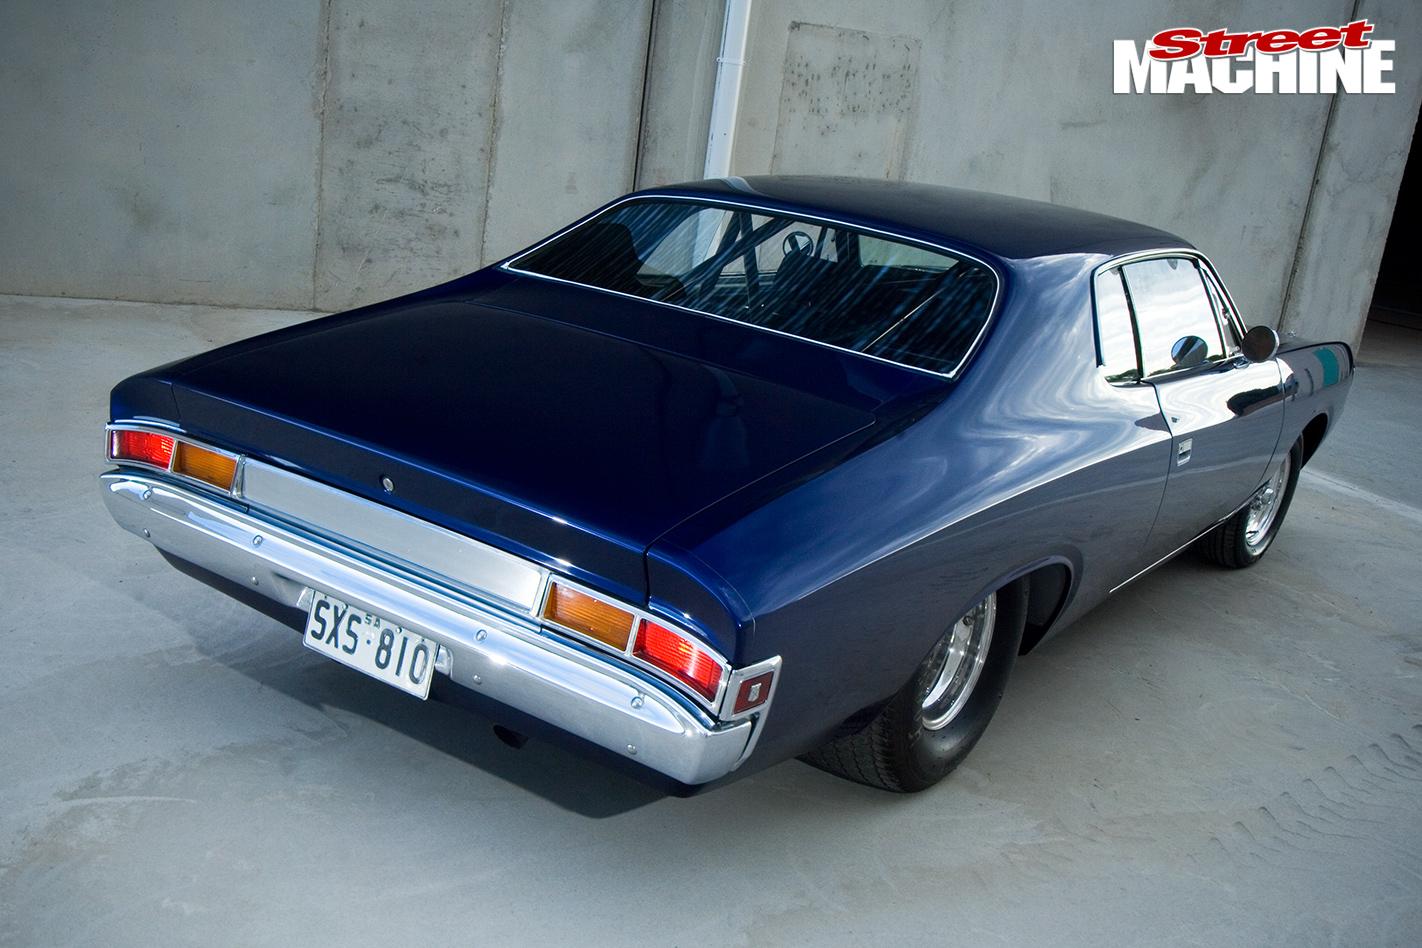 DAVE'S-1972-BLOWN-VH-HARDTOP-2